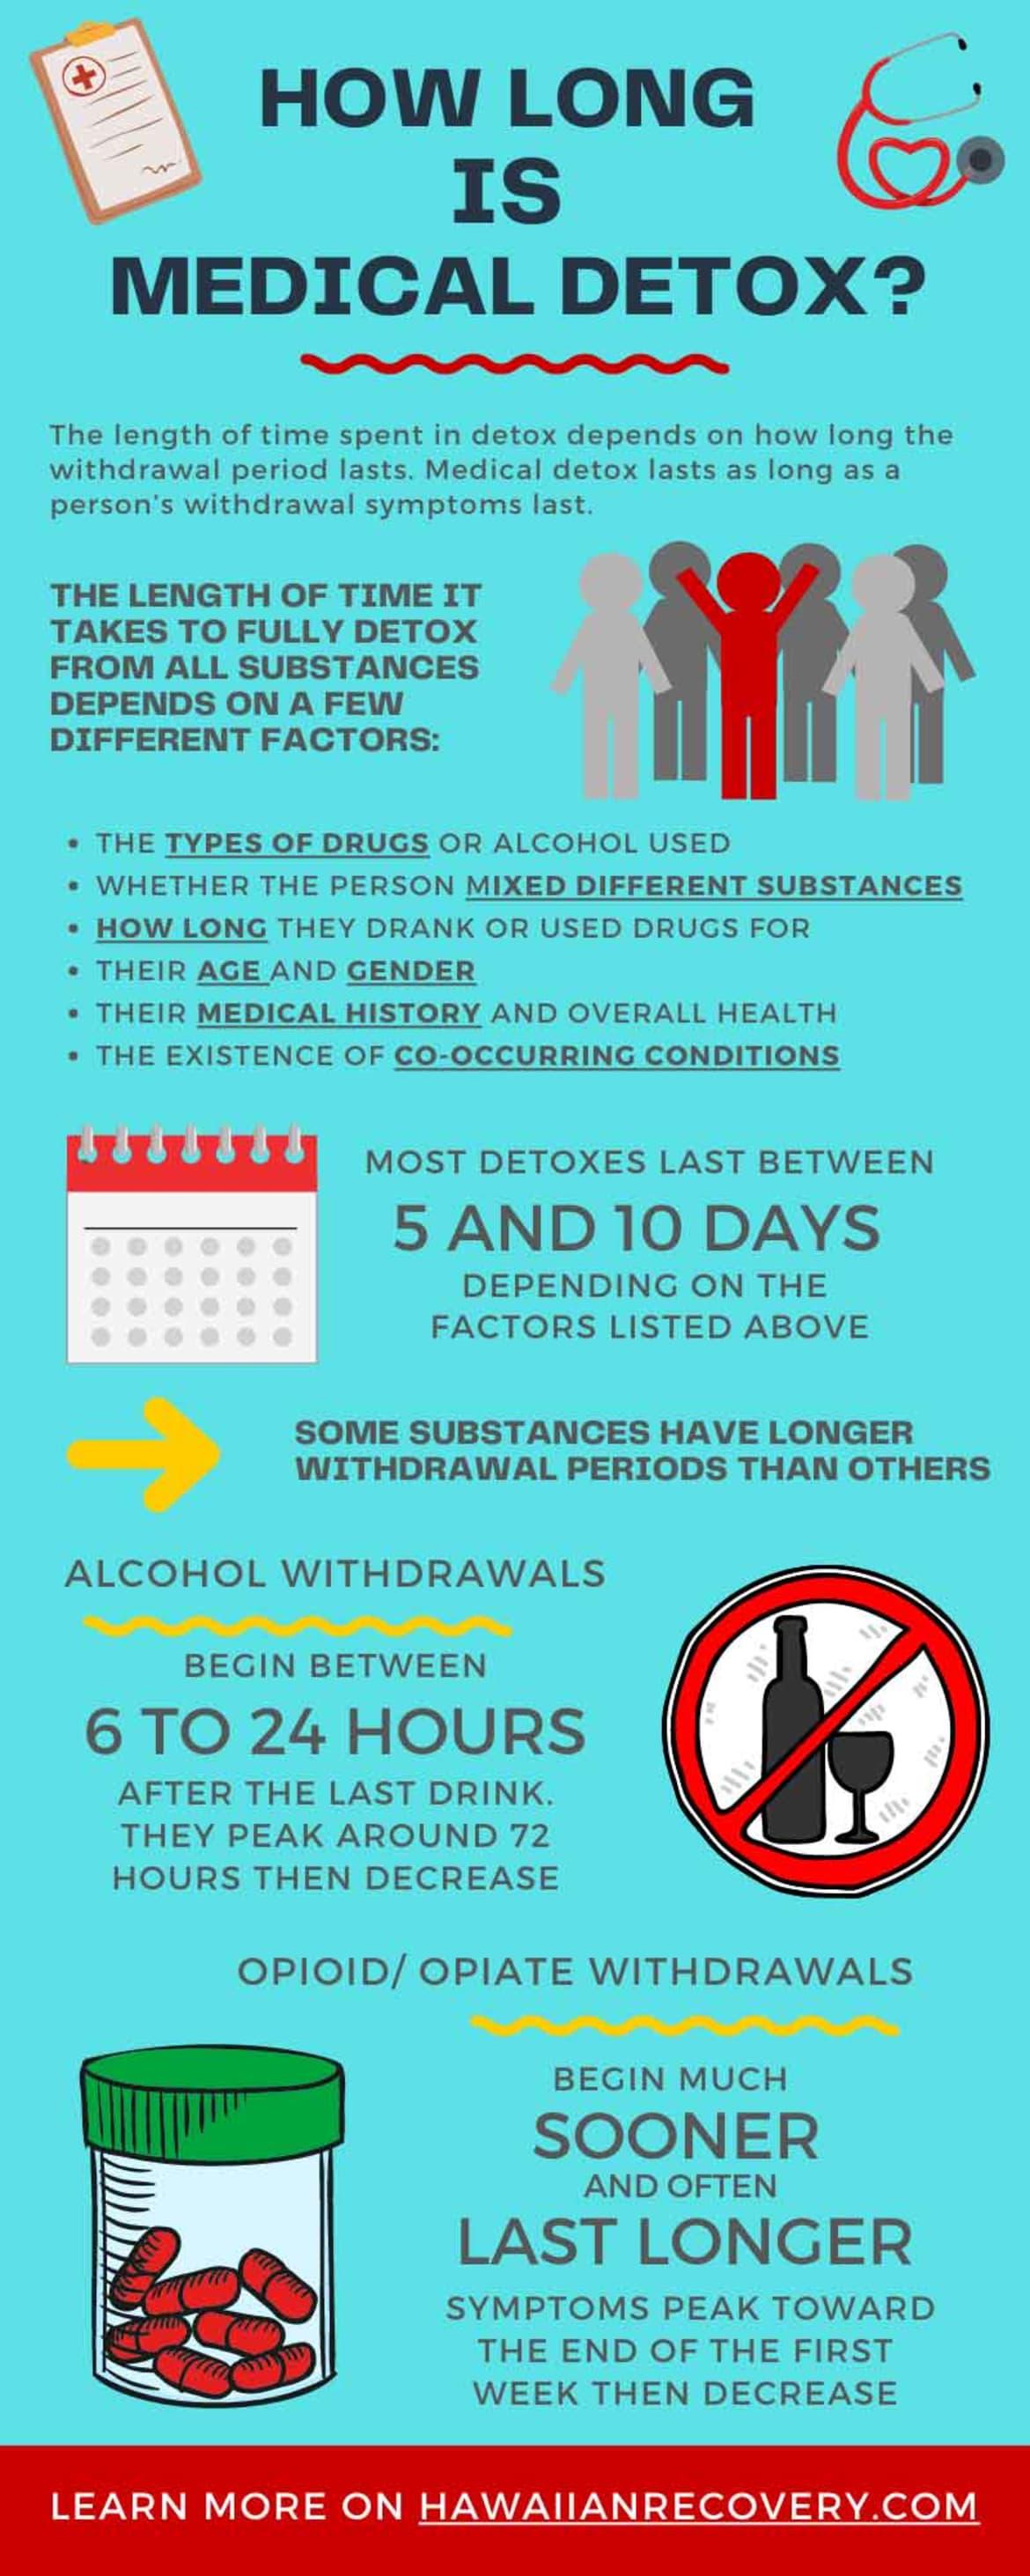 How Long is Medical Detox